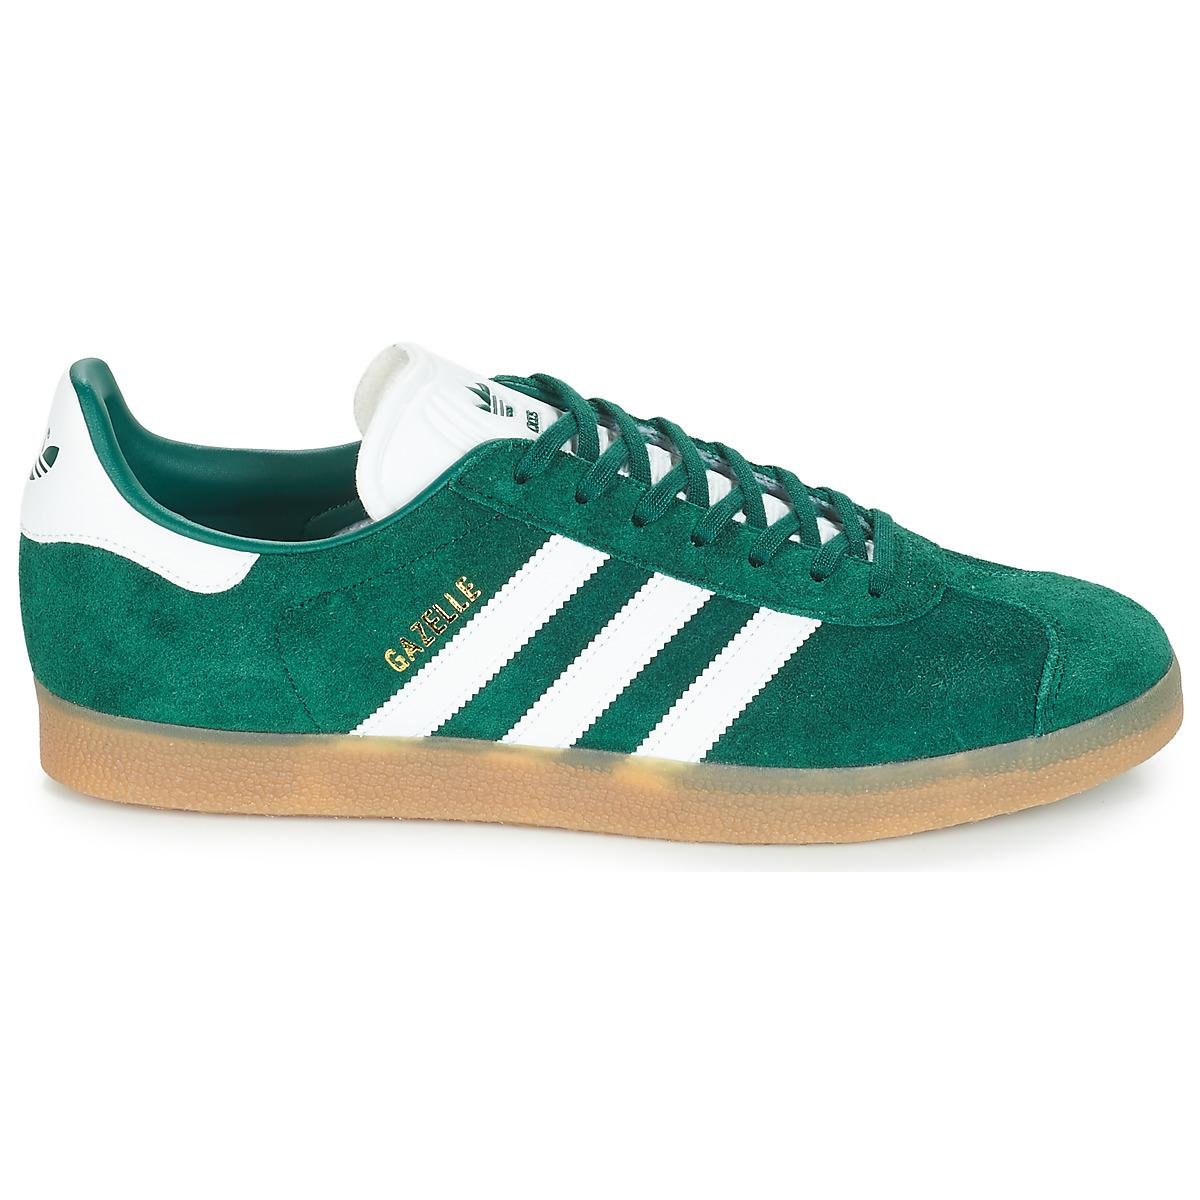 GAZELLE femmes Chaussures en vert adidas en coloris Vert - Lyst